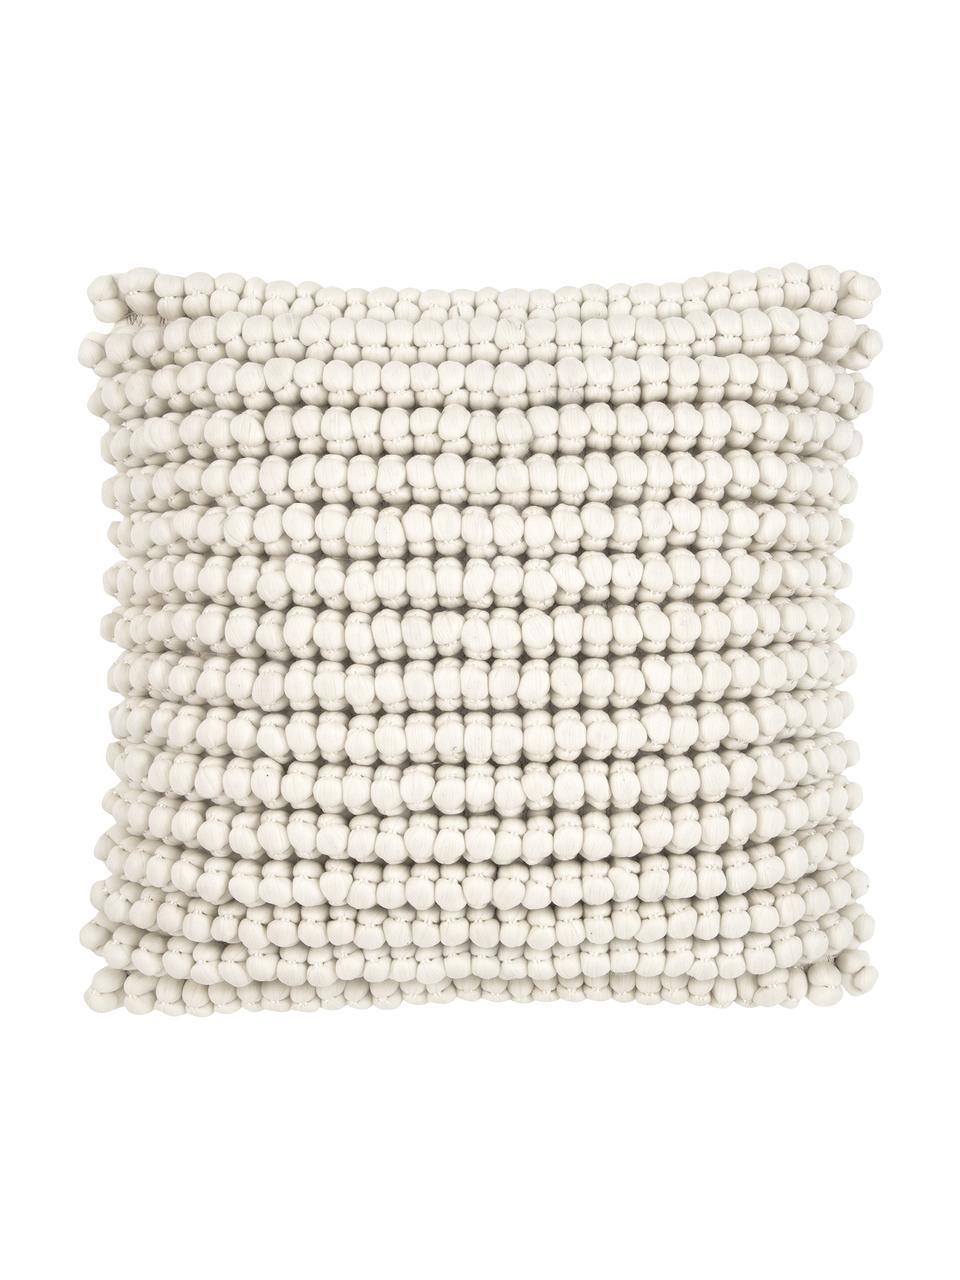 Federa arredo color bianco crema Iona, Retro: cotone, Bianco crema, Larg. 45 x Lung. 45 cm